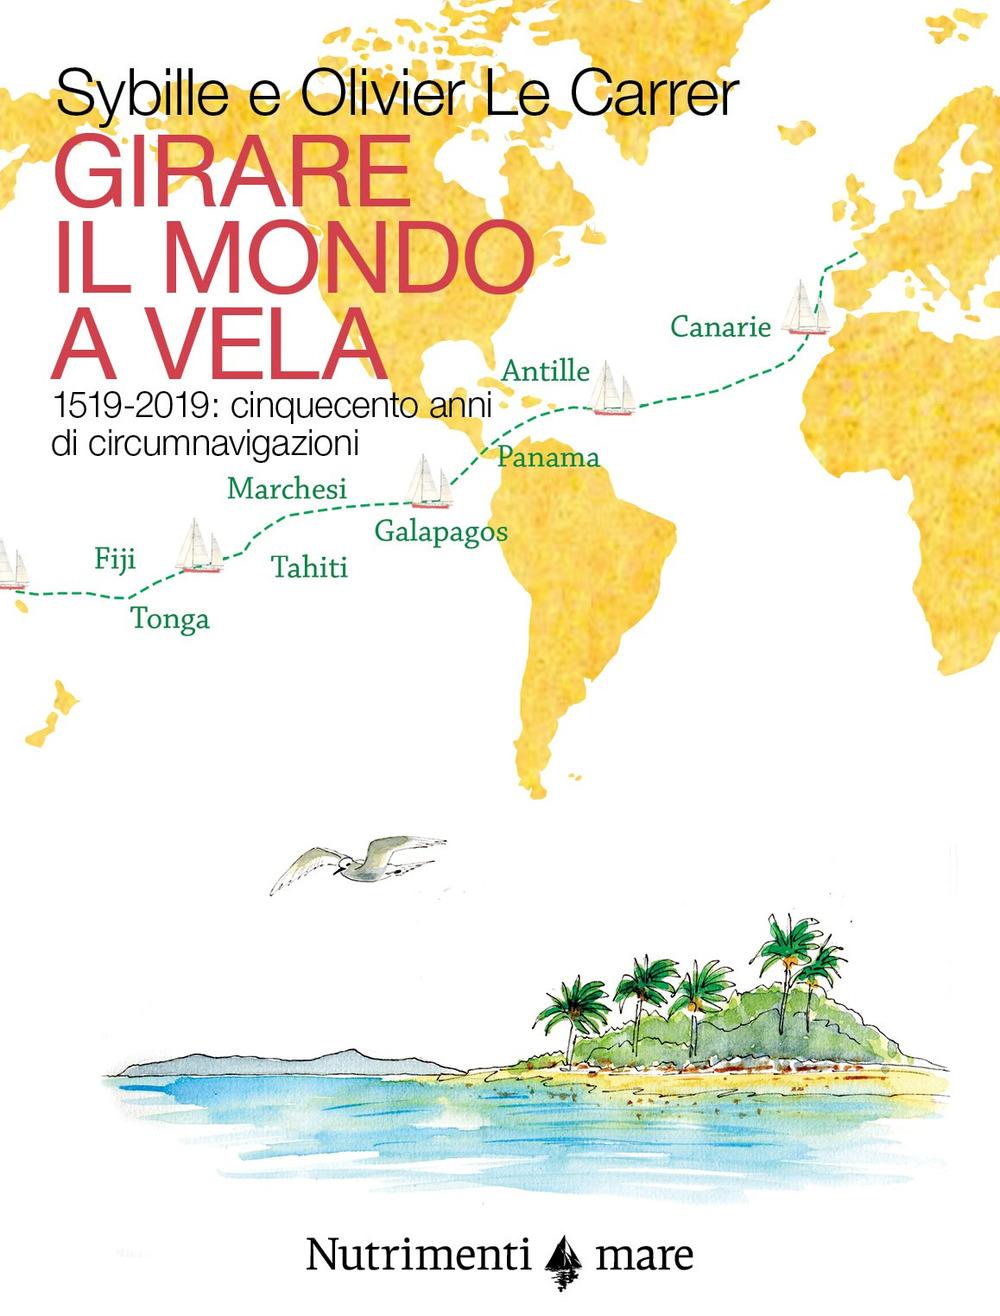 GIRARE IL MONDO A VELA - Le Carrer Sibylle; Le Carrer Olivier - 9788865947760